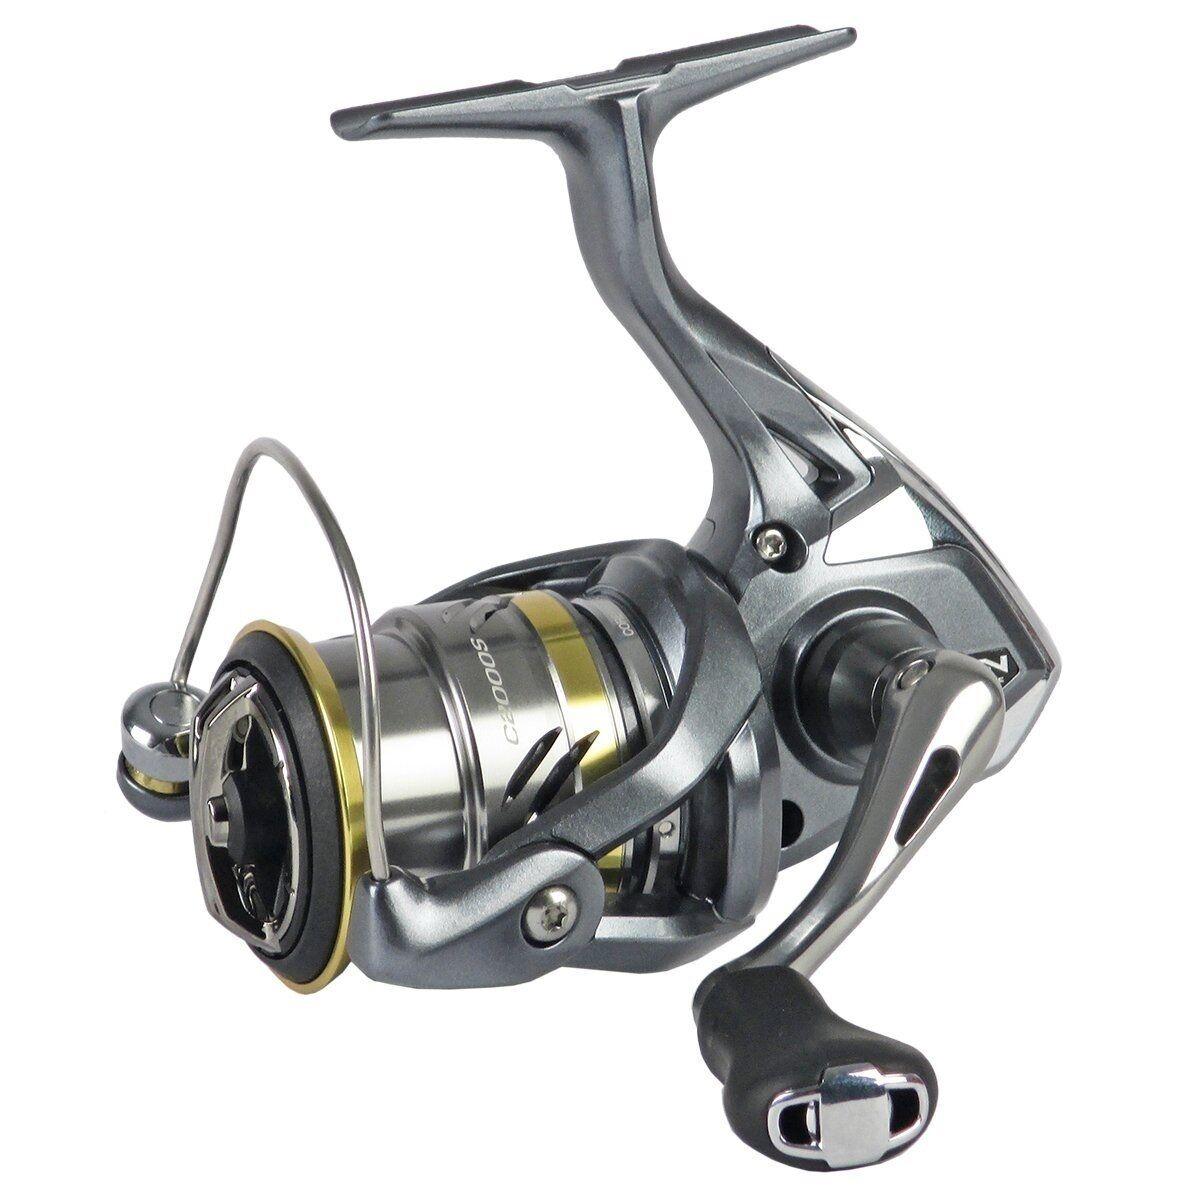 Shimano 17 NEW ULTEGRA 1000 Spininng Reel New